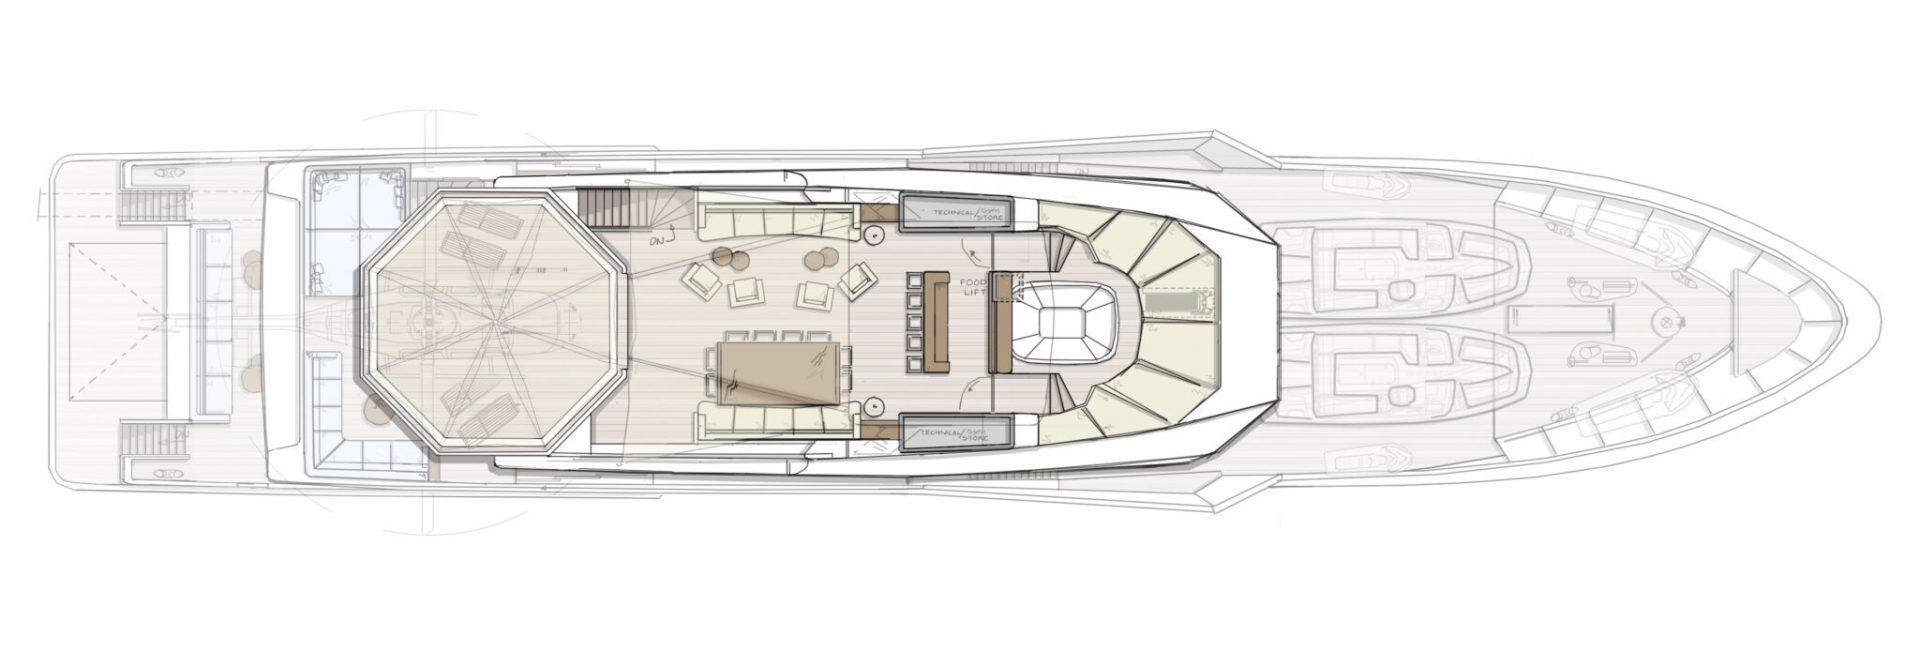 Sundeck - DIANA R.50 - concept design superyacht